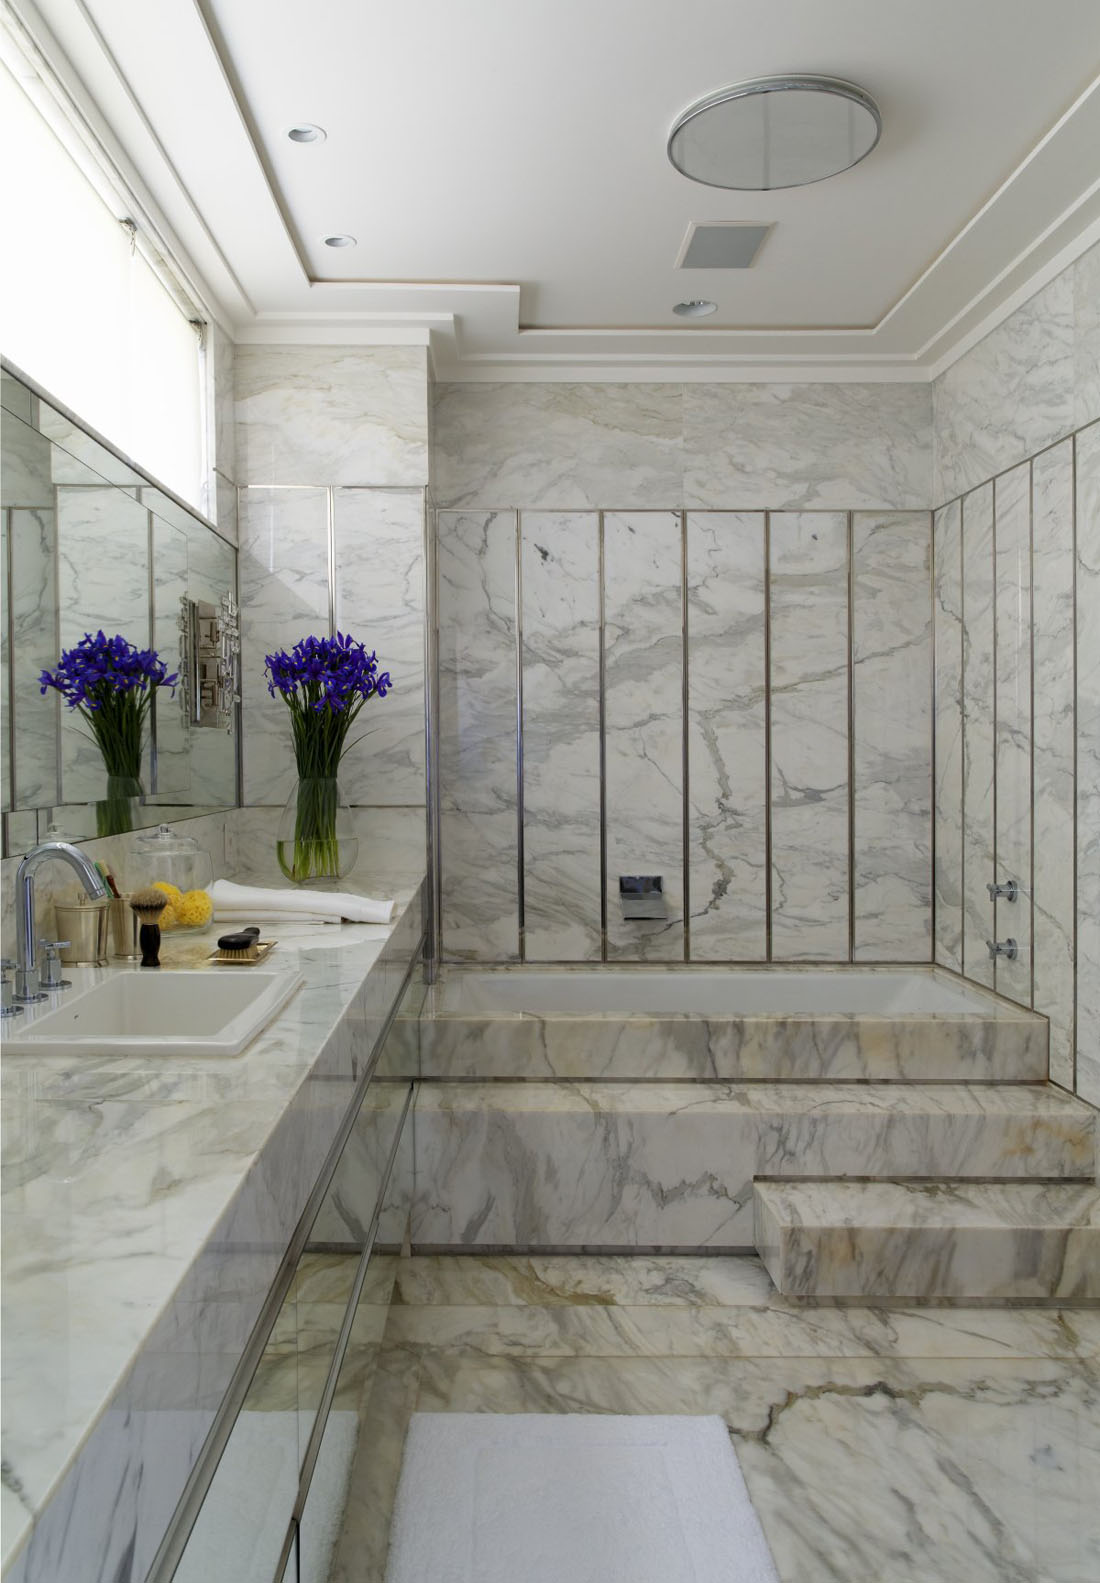 30-Marble-Bathroom-Design-Ideas-22